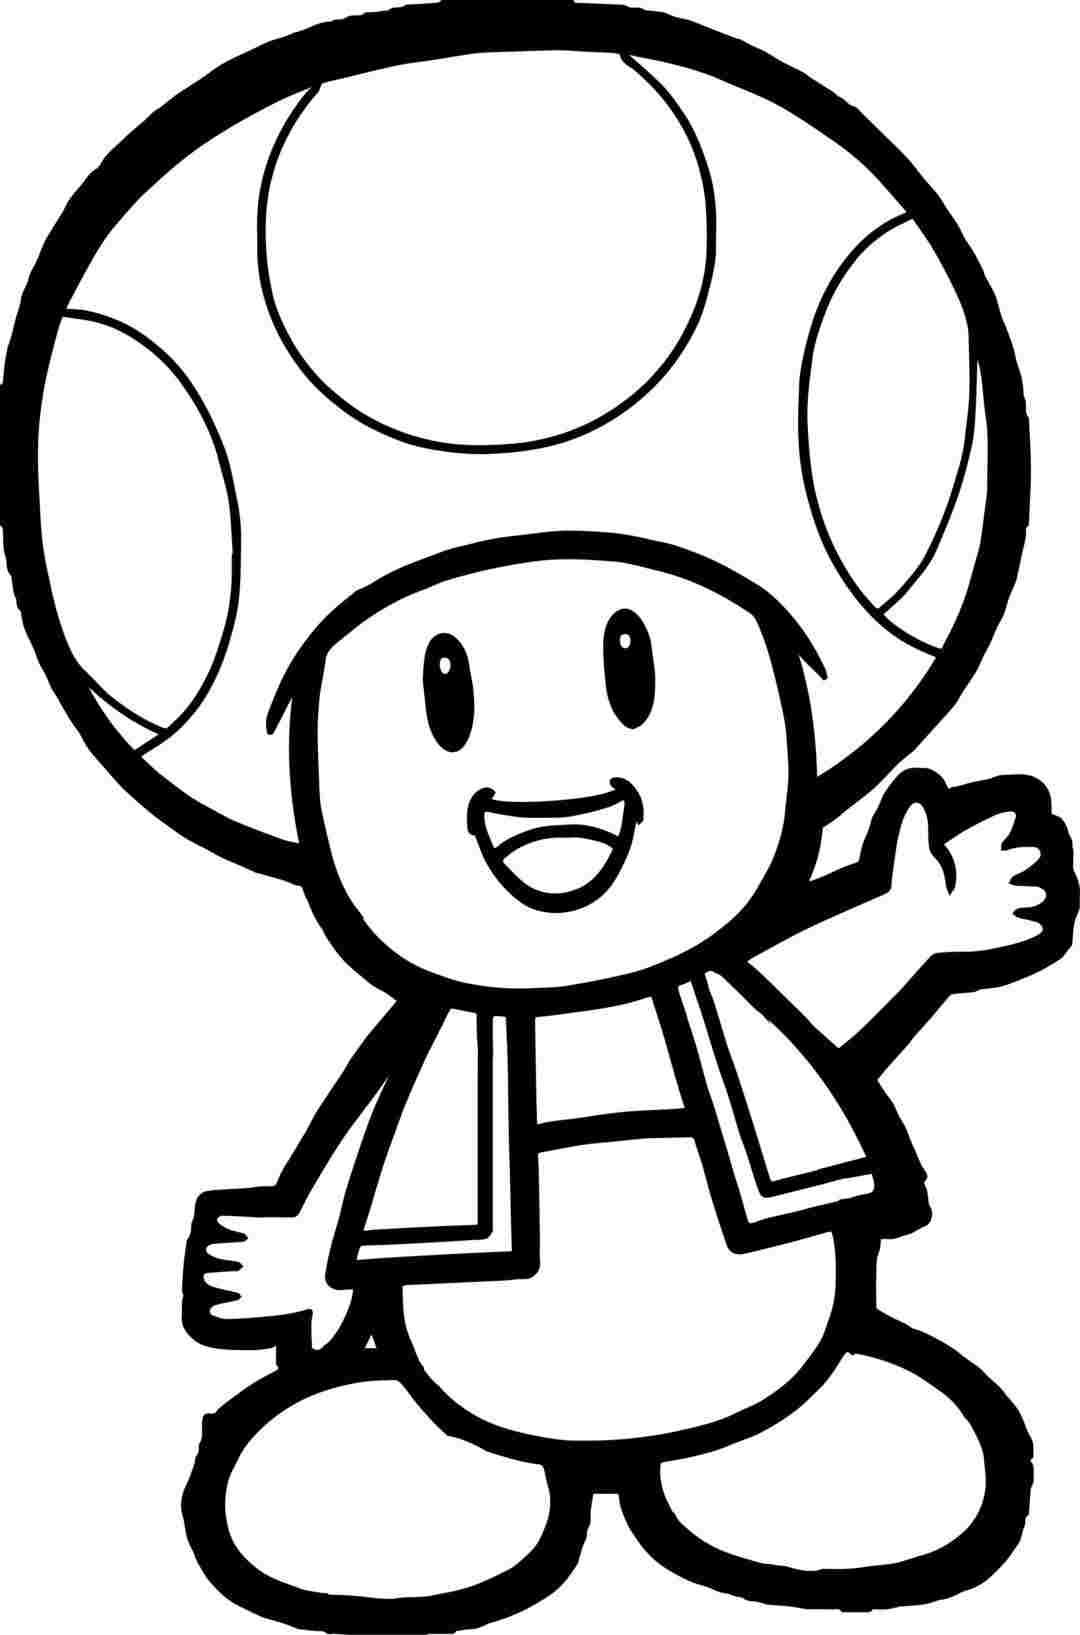 Toad from Super Mario Bros say hi Coloring Page